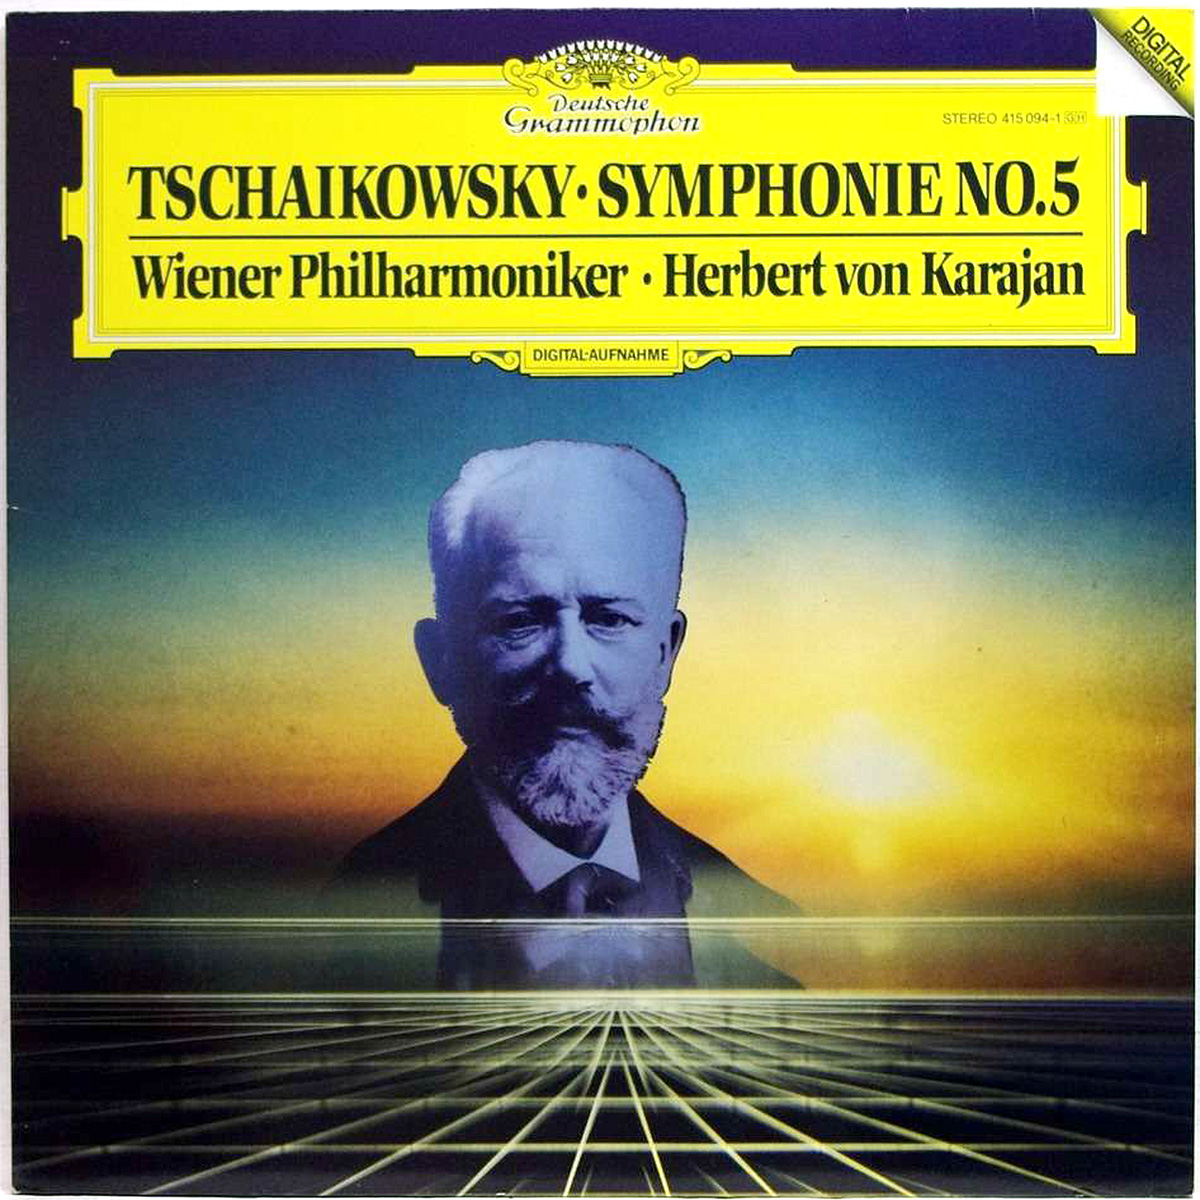 DGG 415094 Tchaikovsky Symphonie 5 Karajan DGG Digital Aufnahme